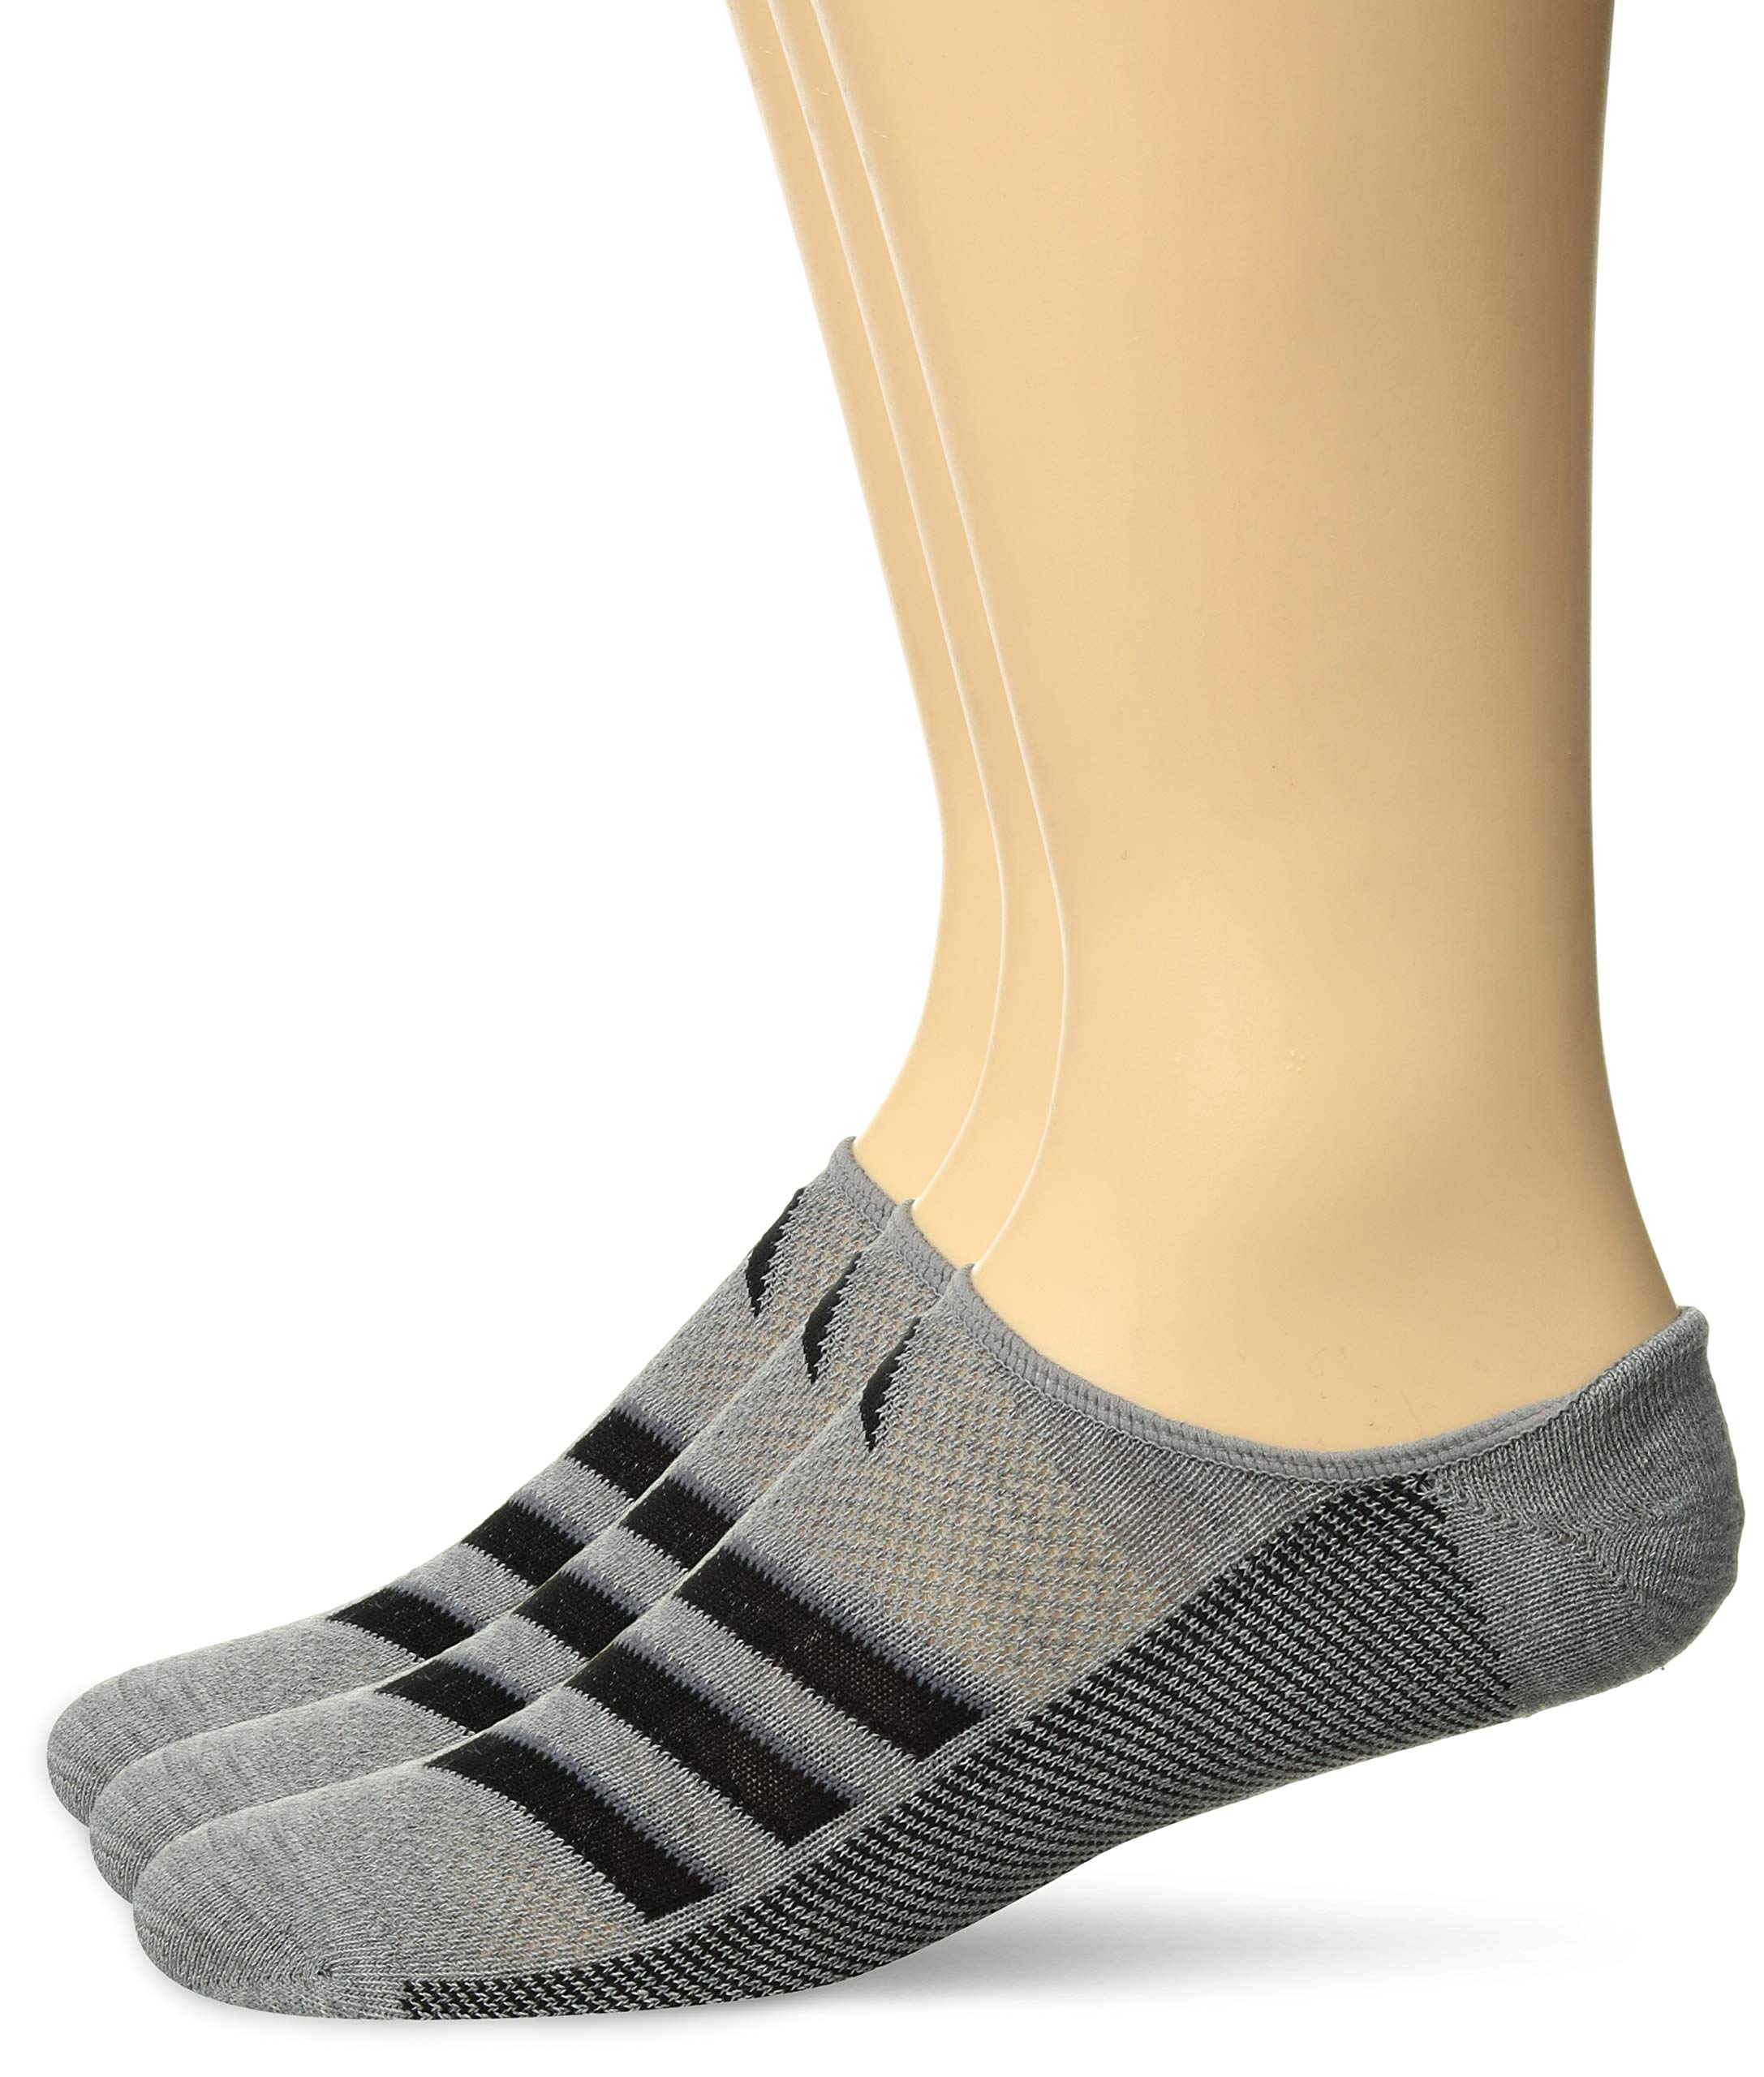 adidas Men's Climacool Superlite Super No Show Socks (3-Pack), Core Heather/Black/Onix, Size 6-12